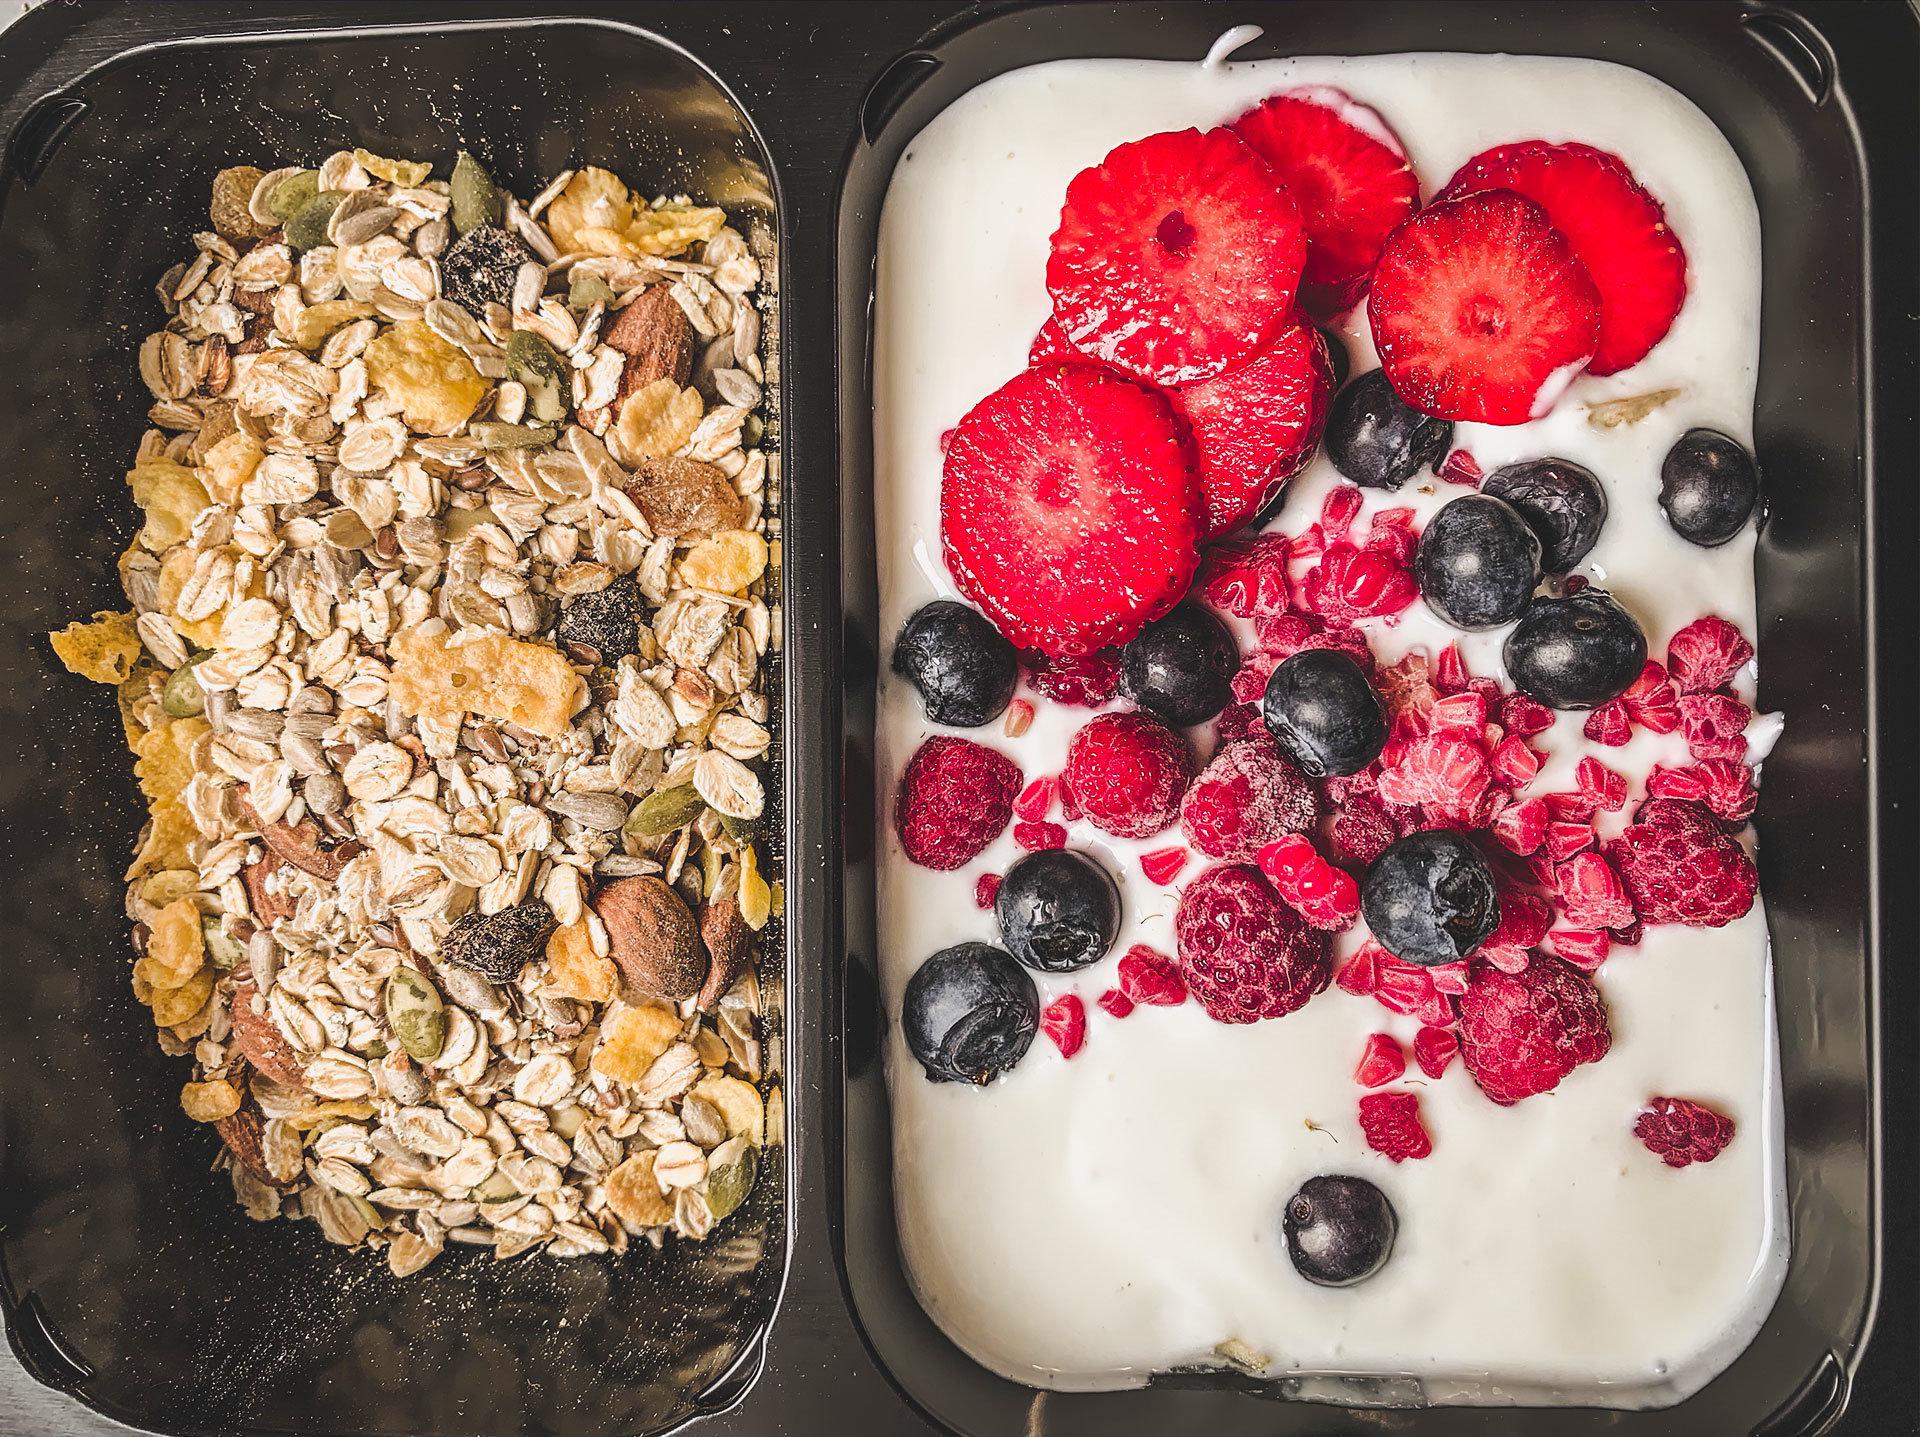 Obrazek Dieta bez laktozy na 20 dni 1500 kalorii